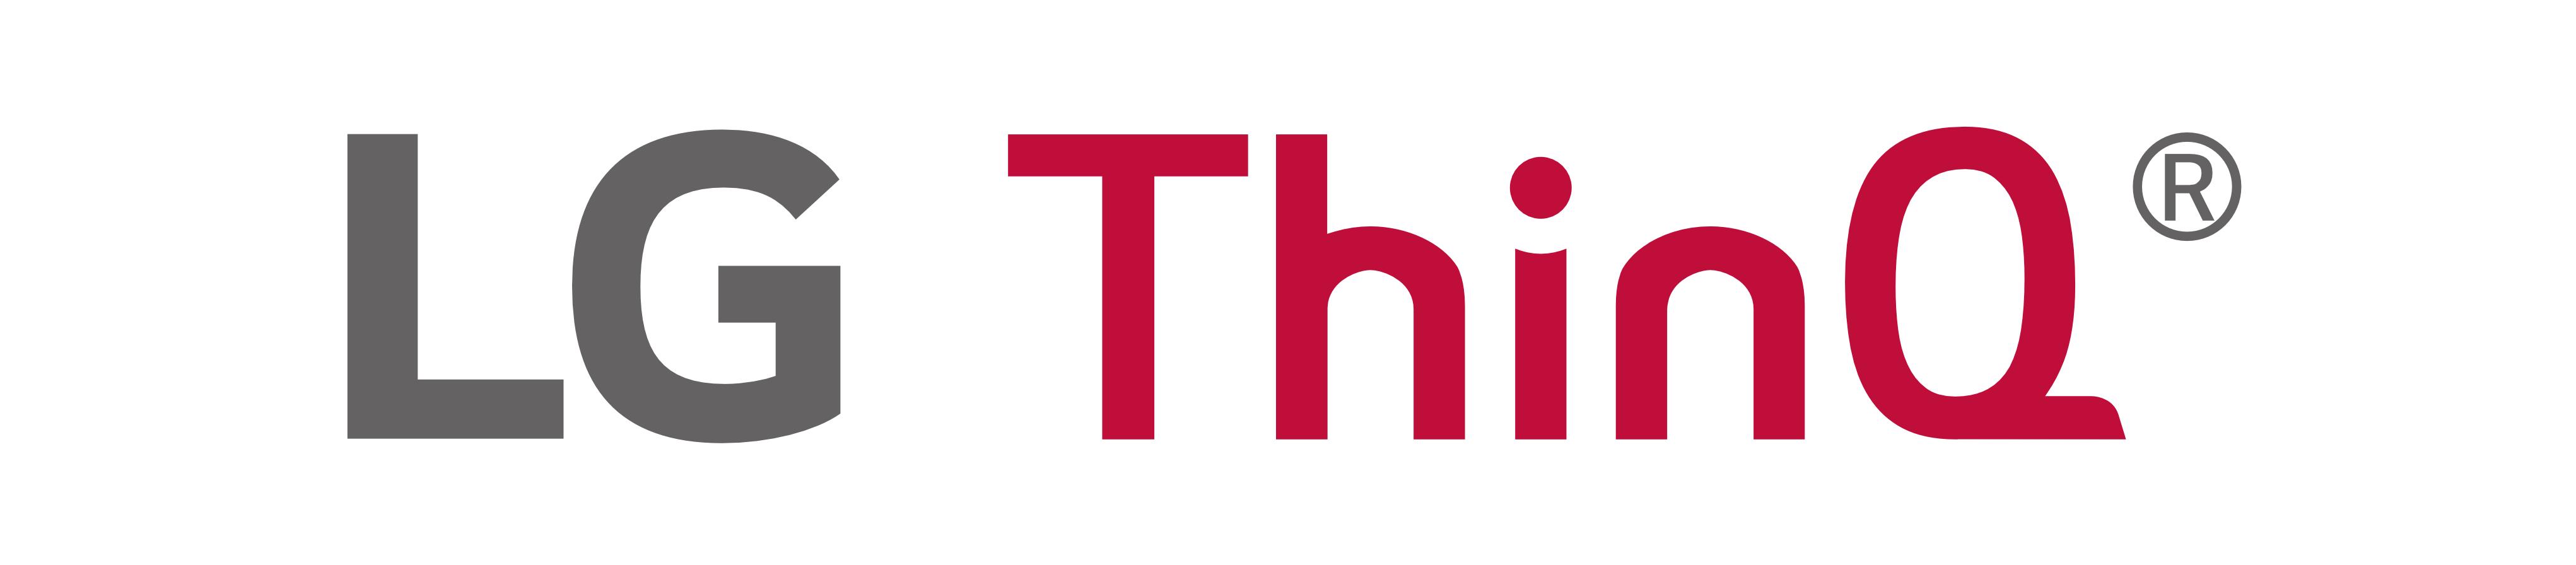 lg_thinq_logo_white.jpg